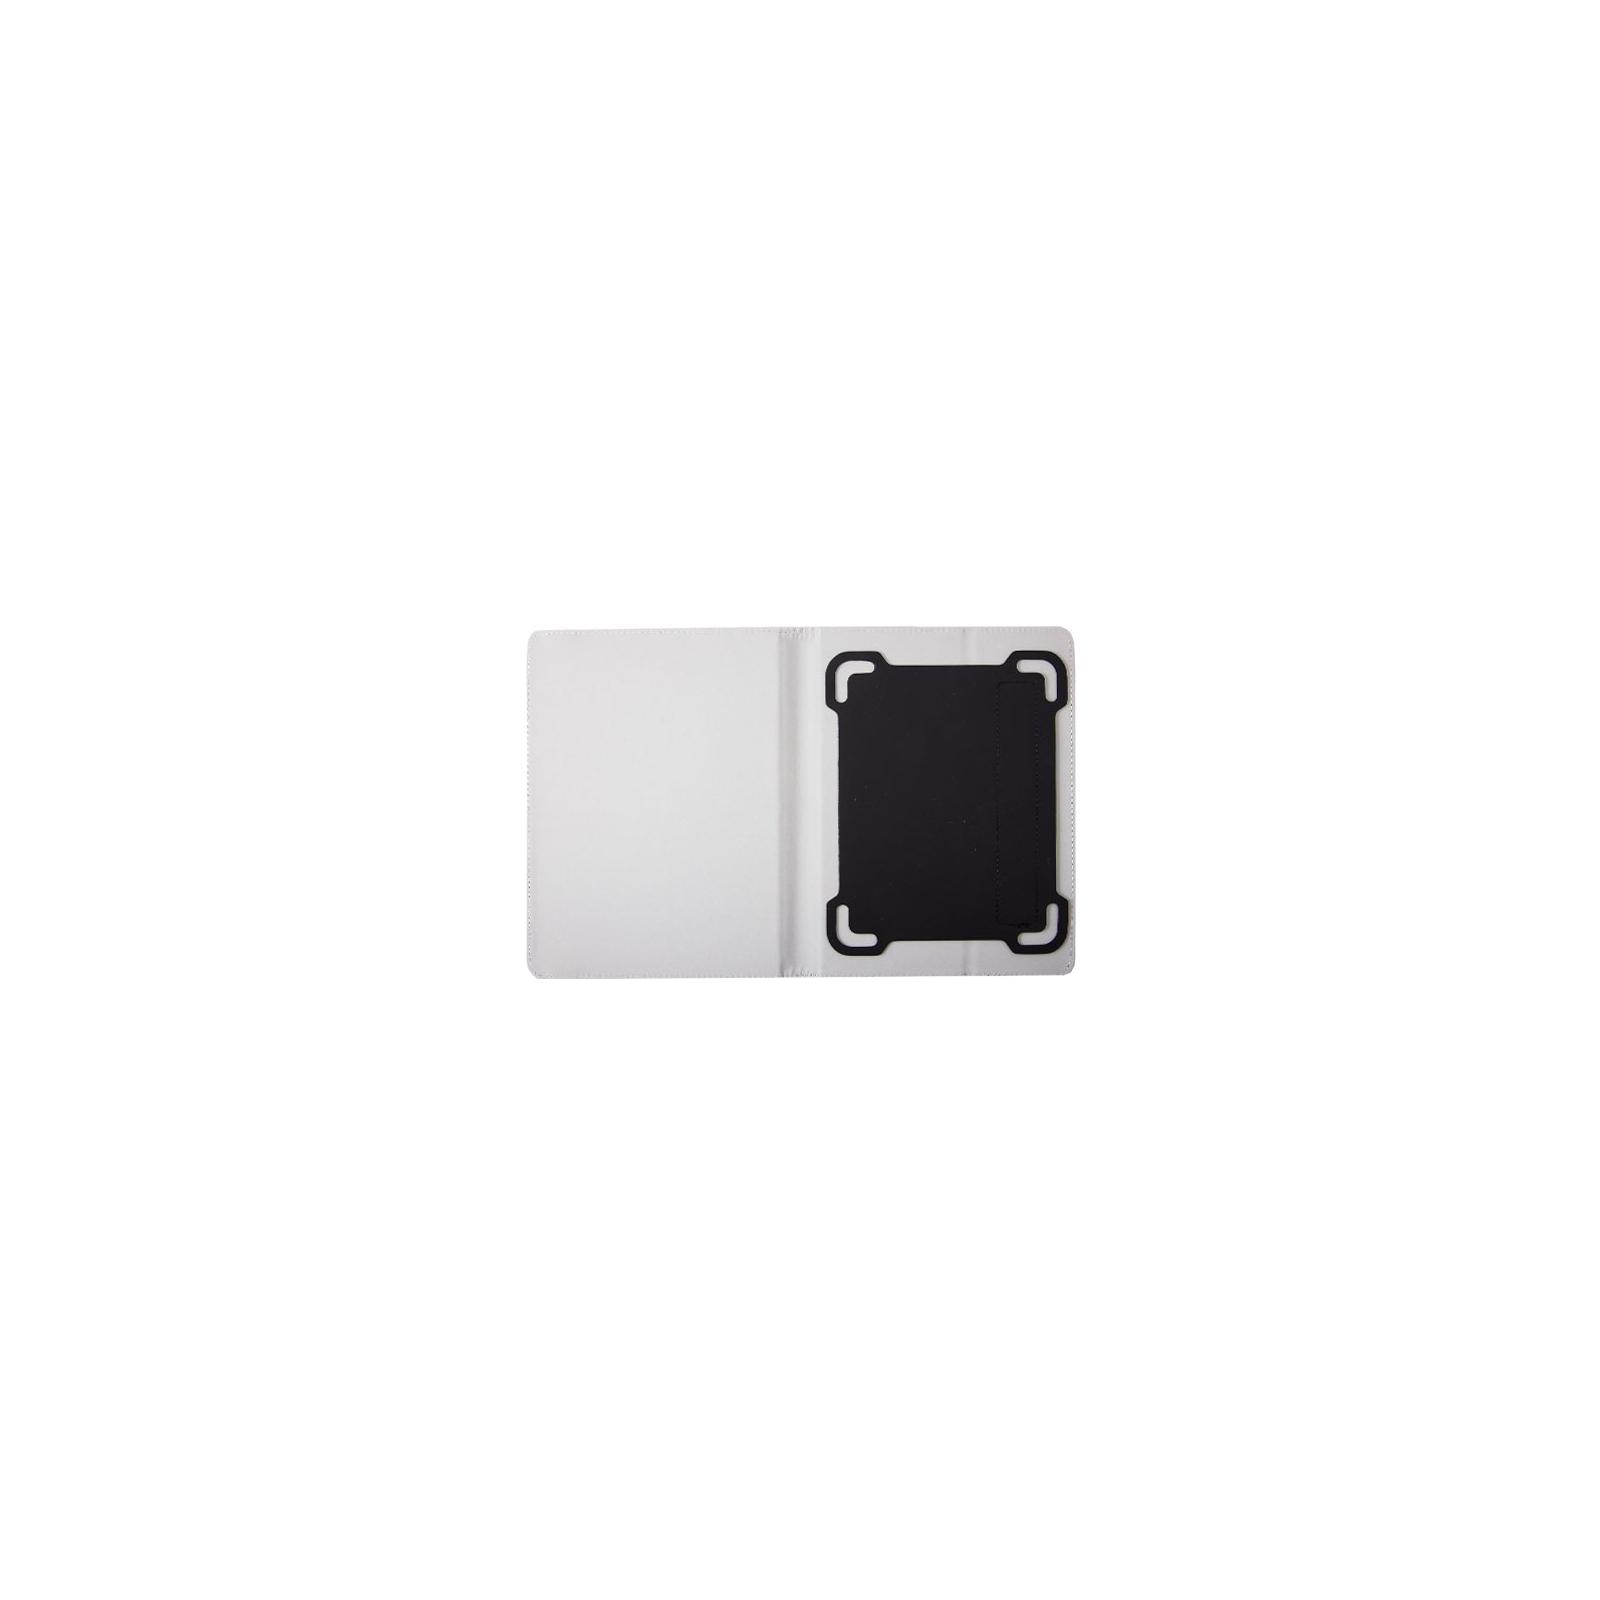 "Чехол для планшета Drobak 8"" Universal stand Black (216874) изображение 2"